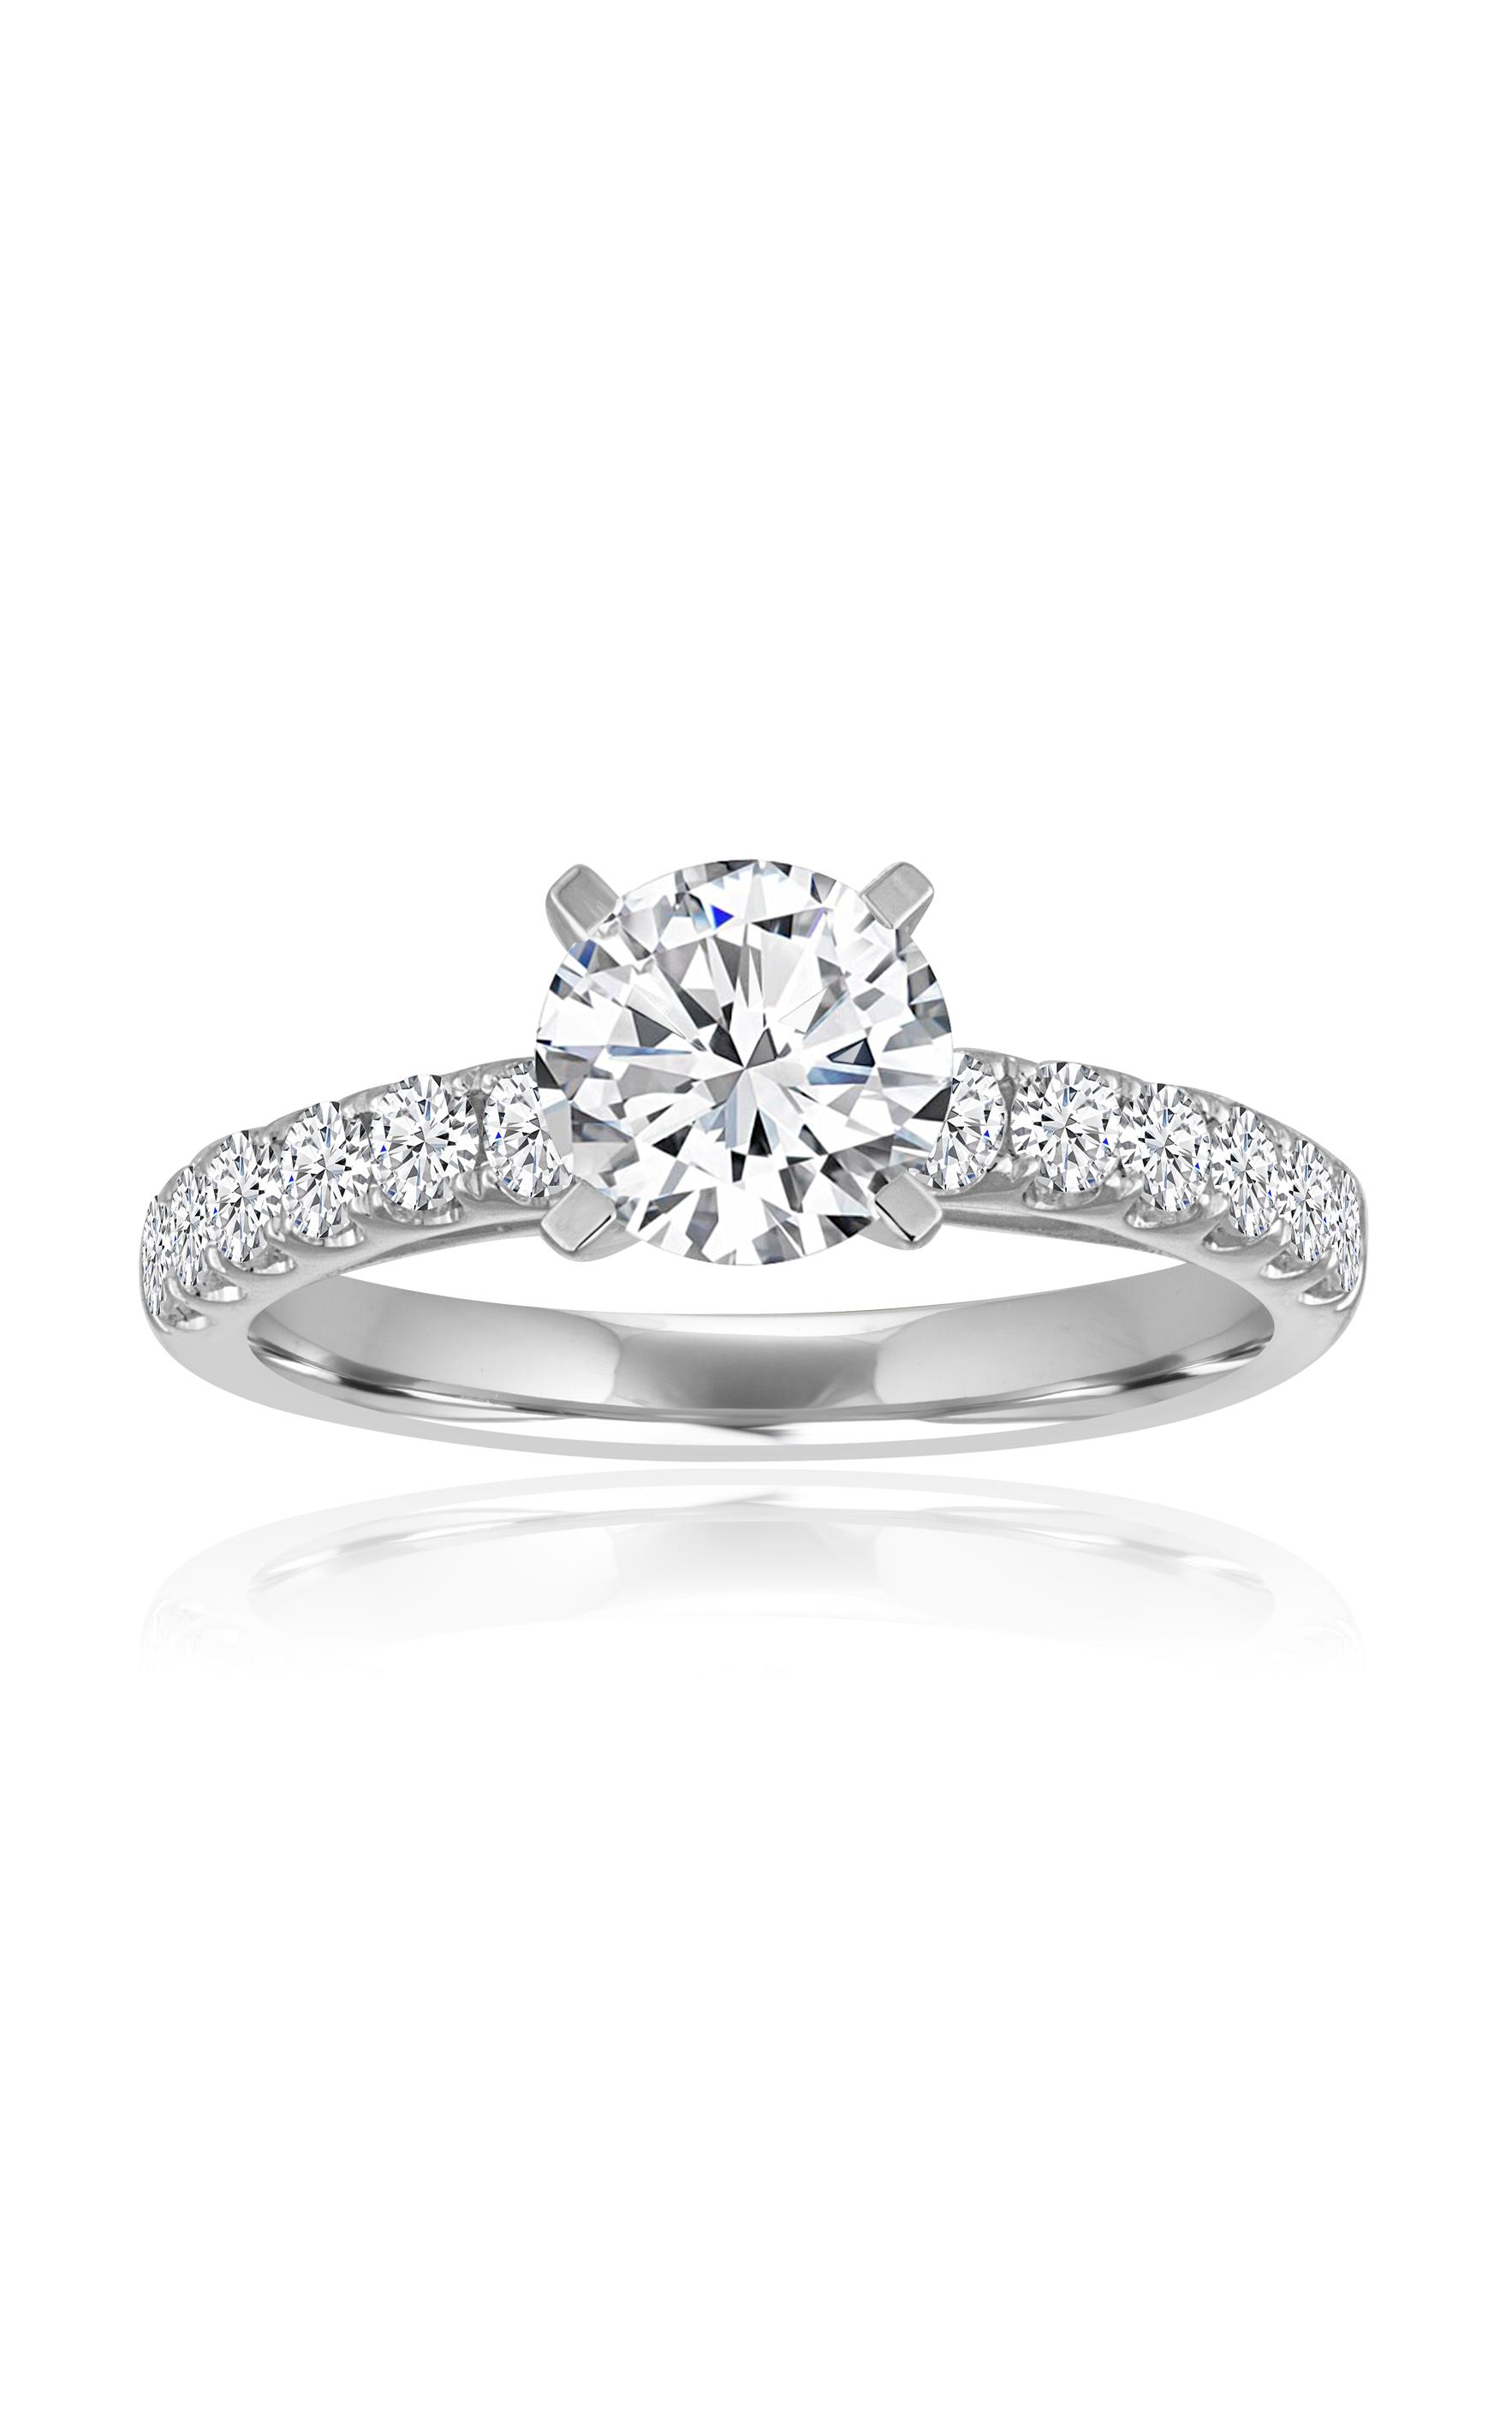 Imagine Bridal Engagement Ring 60156D-1/4 product image